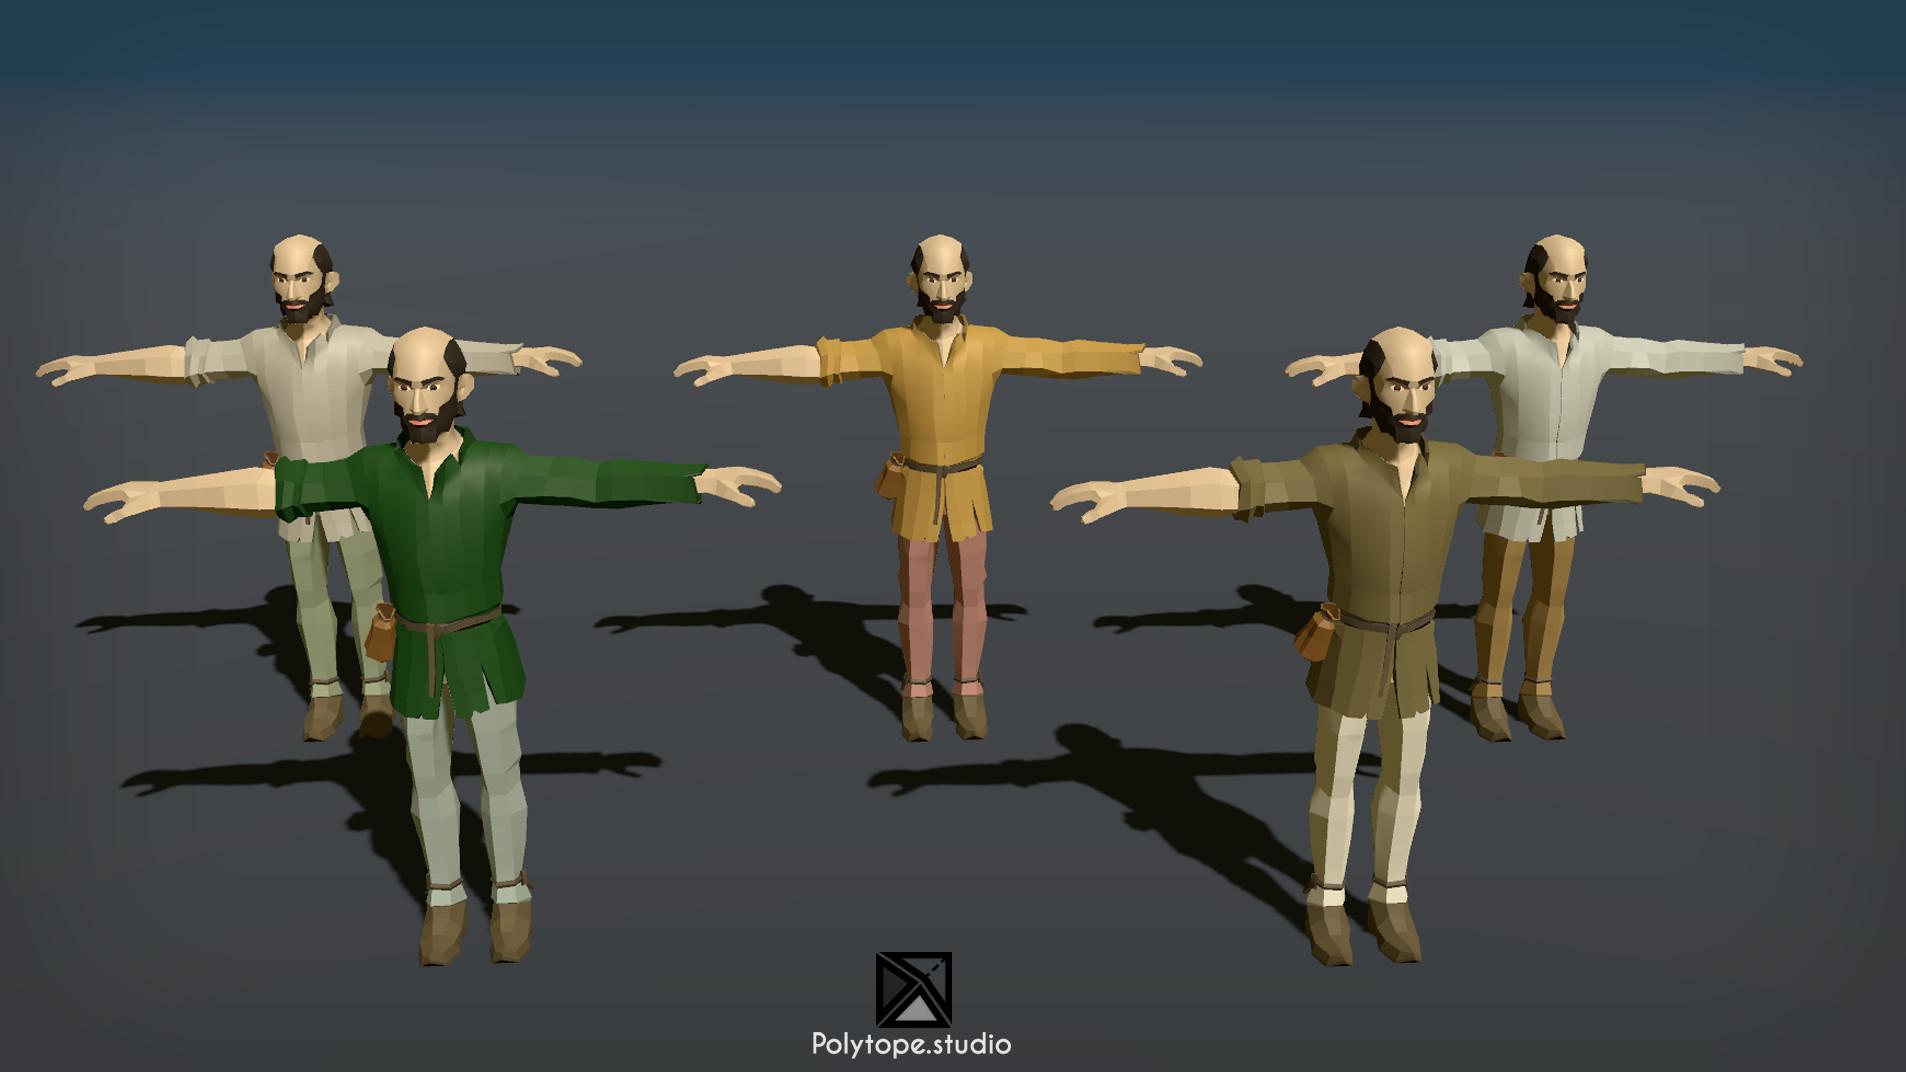 Polytope studio pt medieval peasant team variations